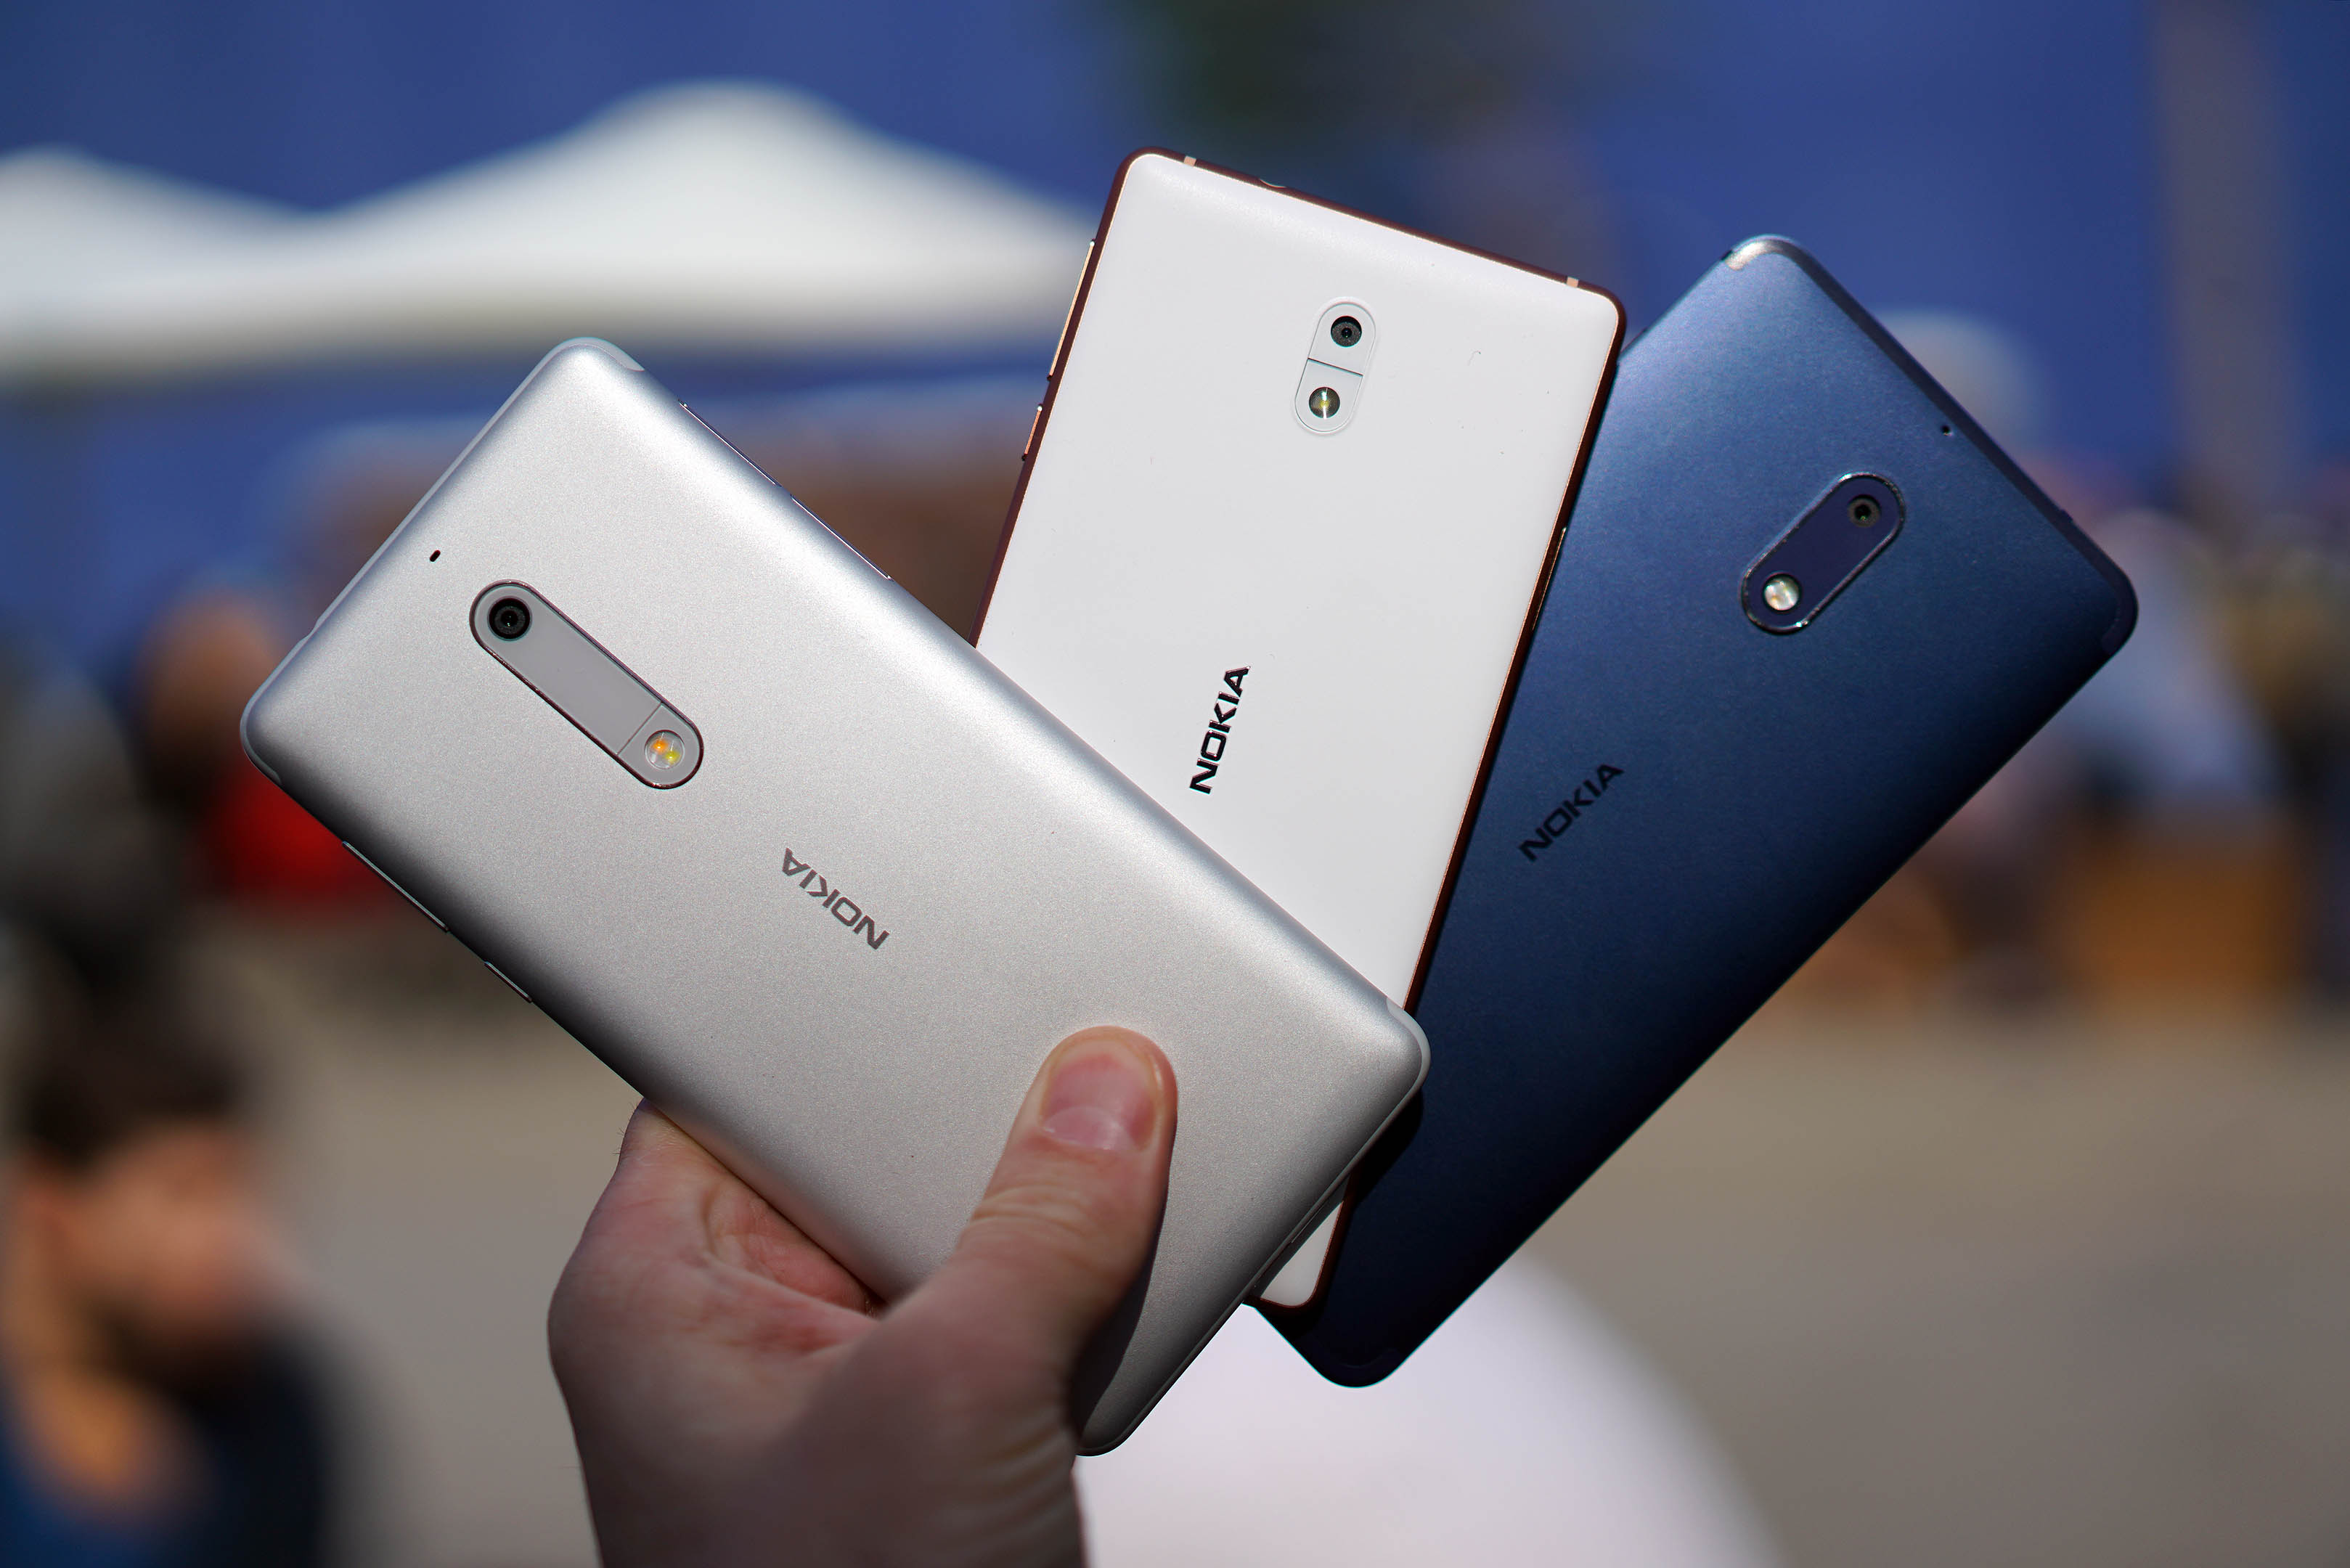 Сравнение Nokia 3, 5 и 6 | MWC 2017